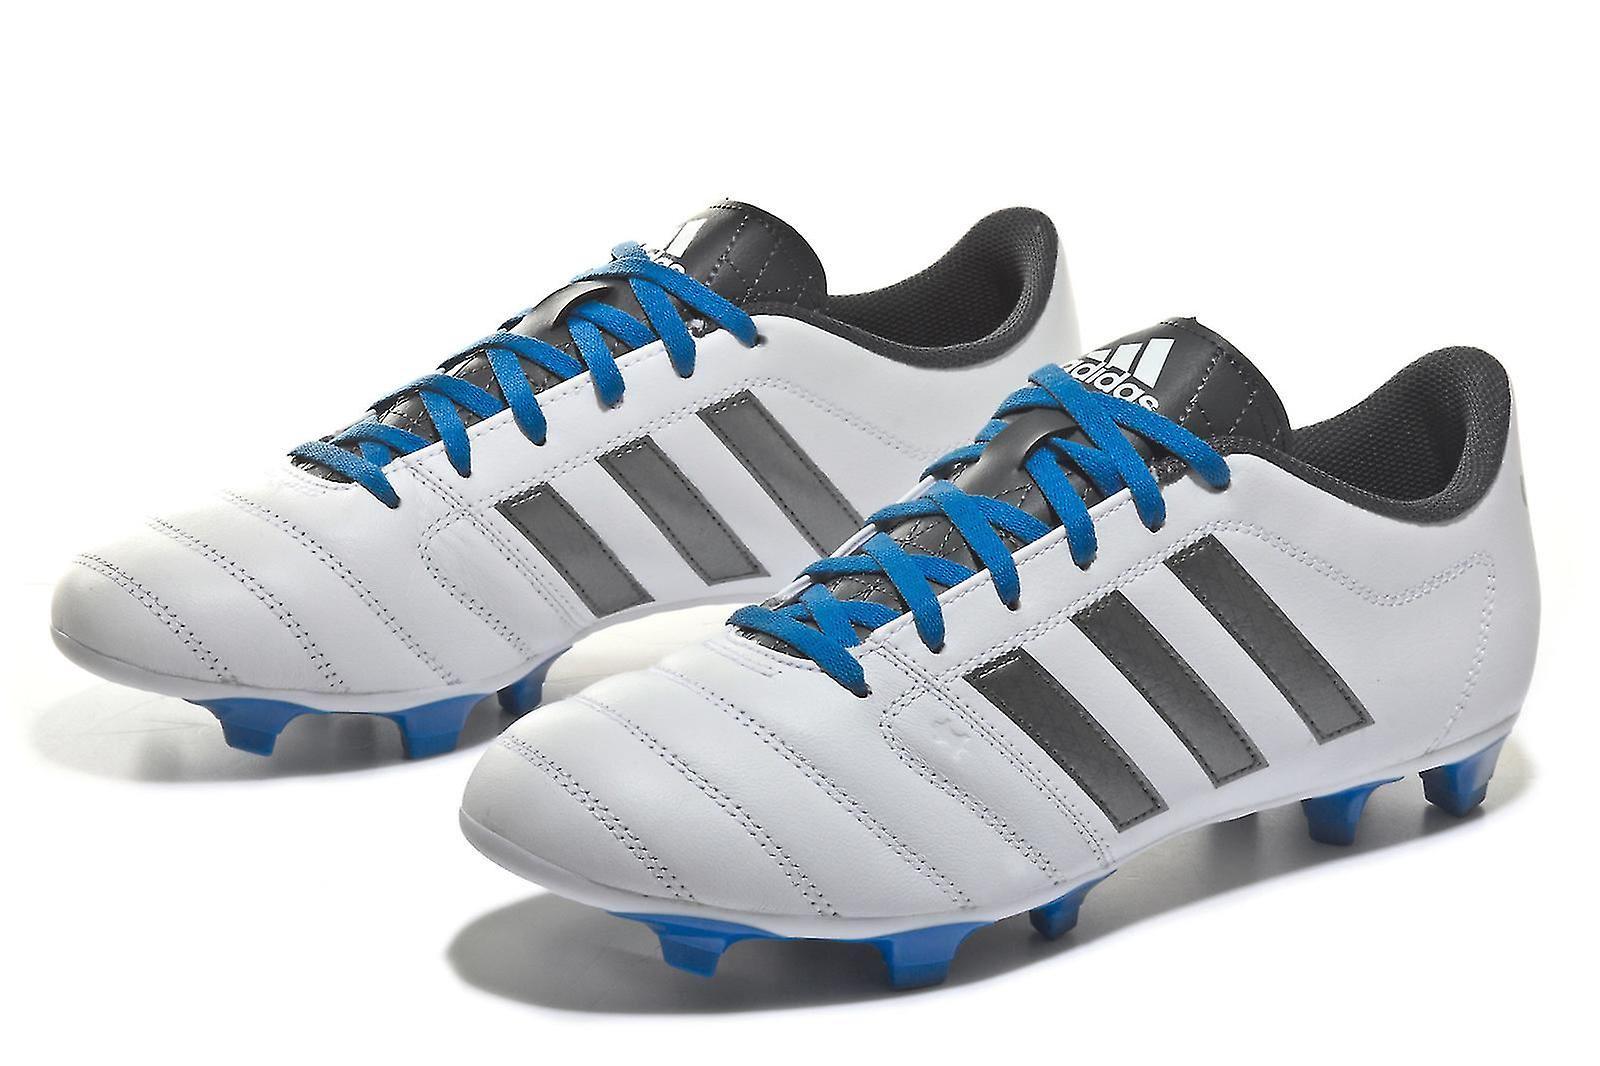 adidas Gloro 16.2 Fg Junior Football Boots White UK3.5/EU36